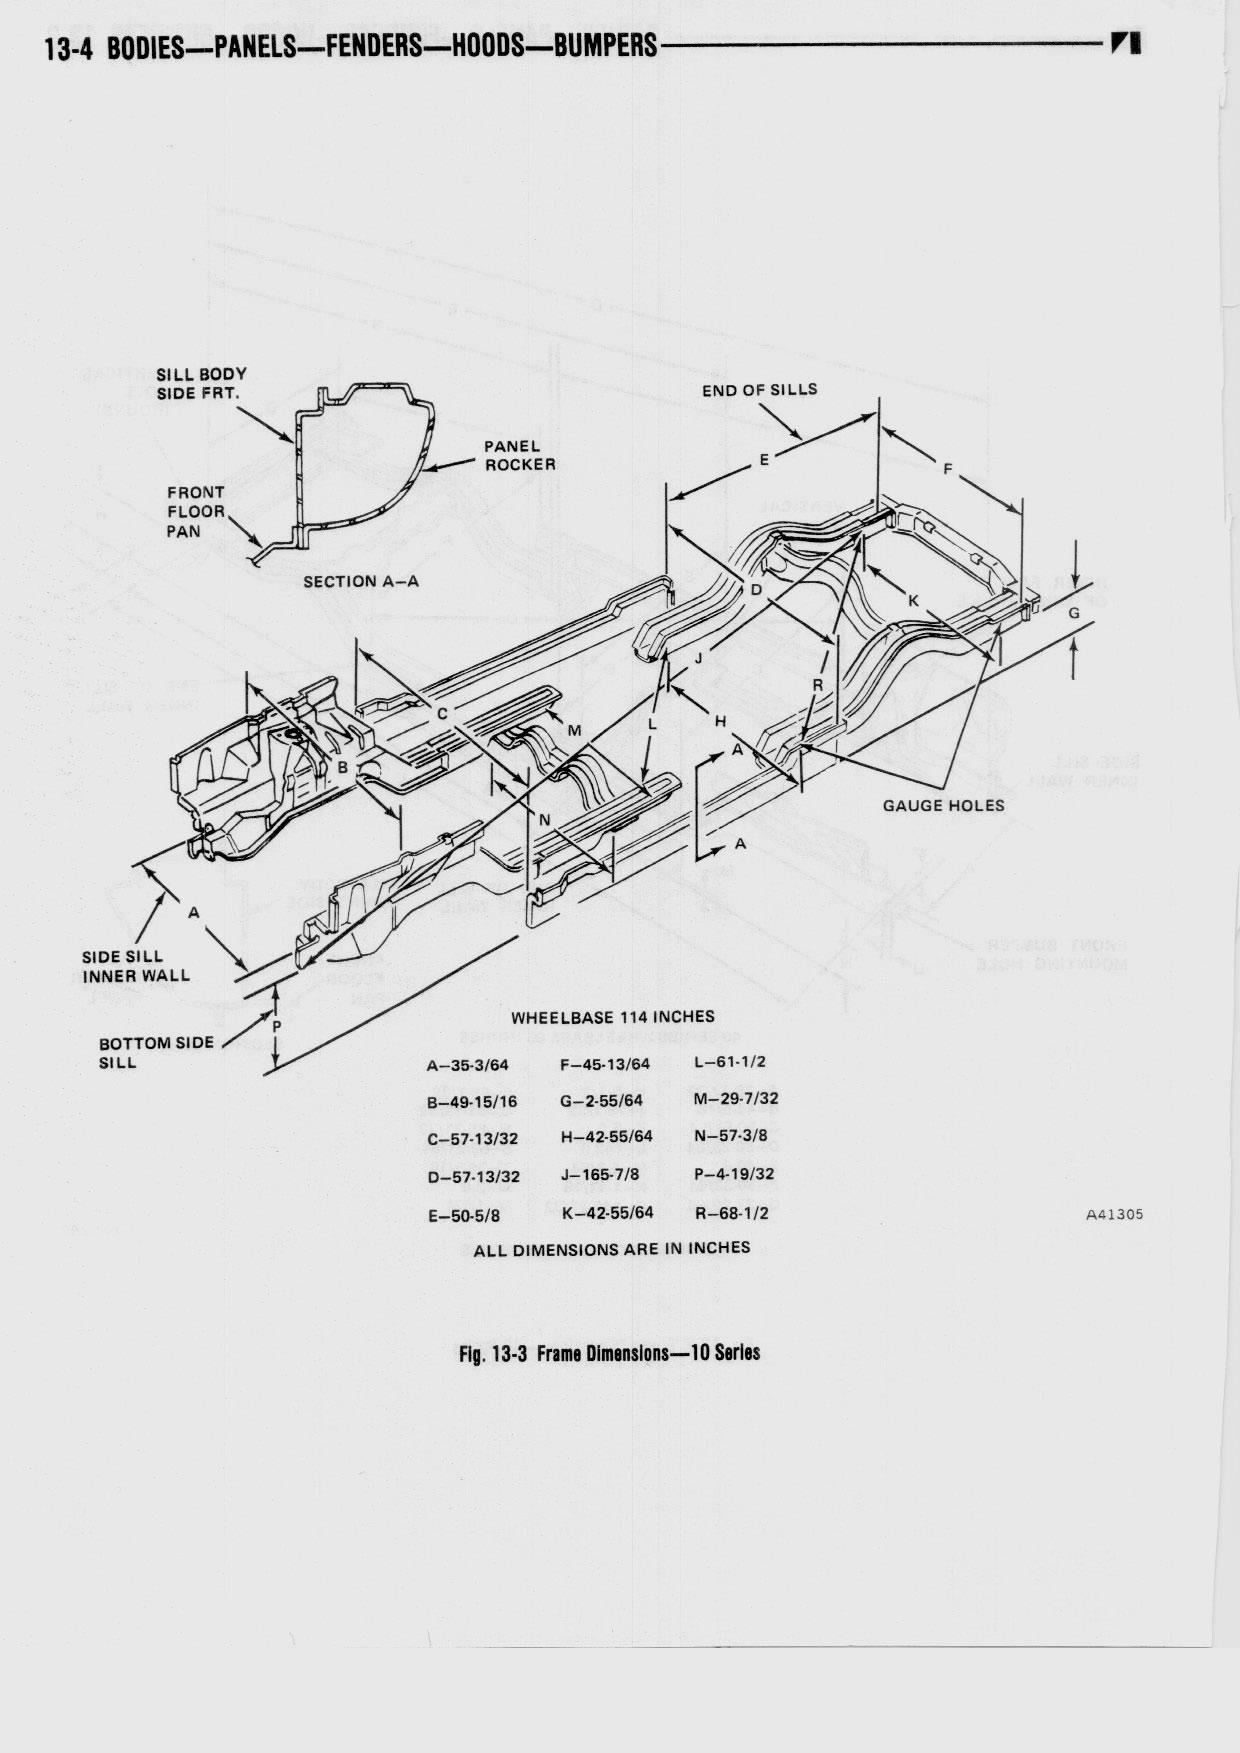 13 Bodies Panels fenders Hoods / 1976 AMC Technical